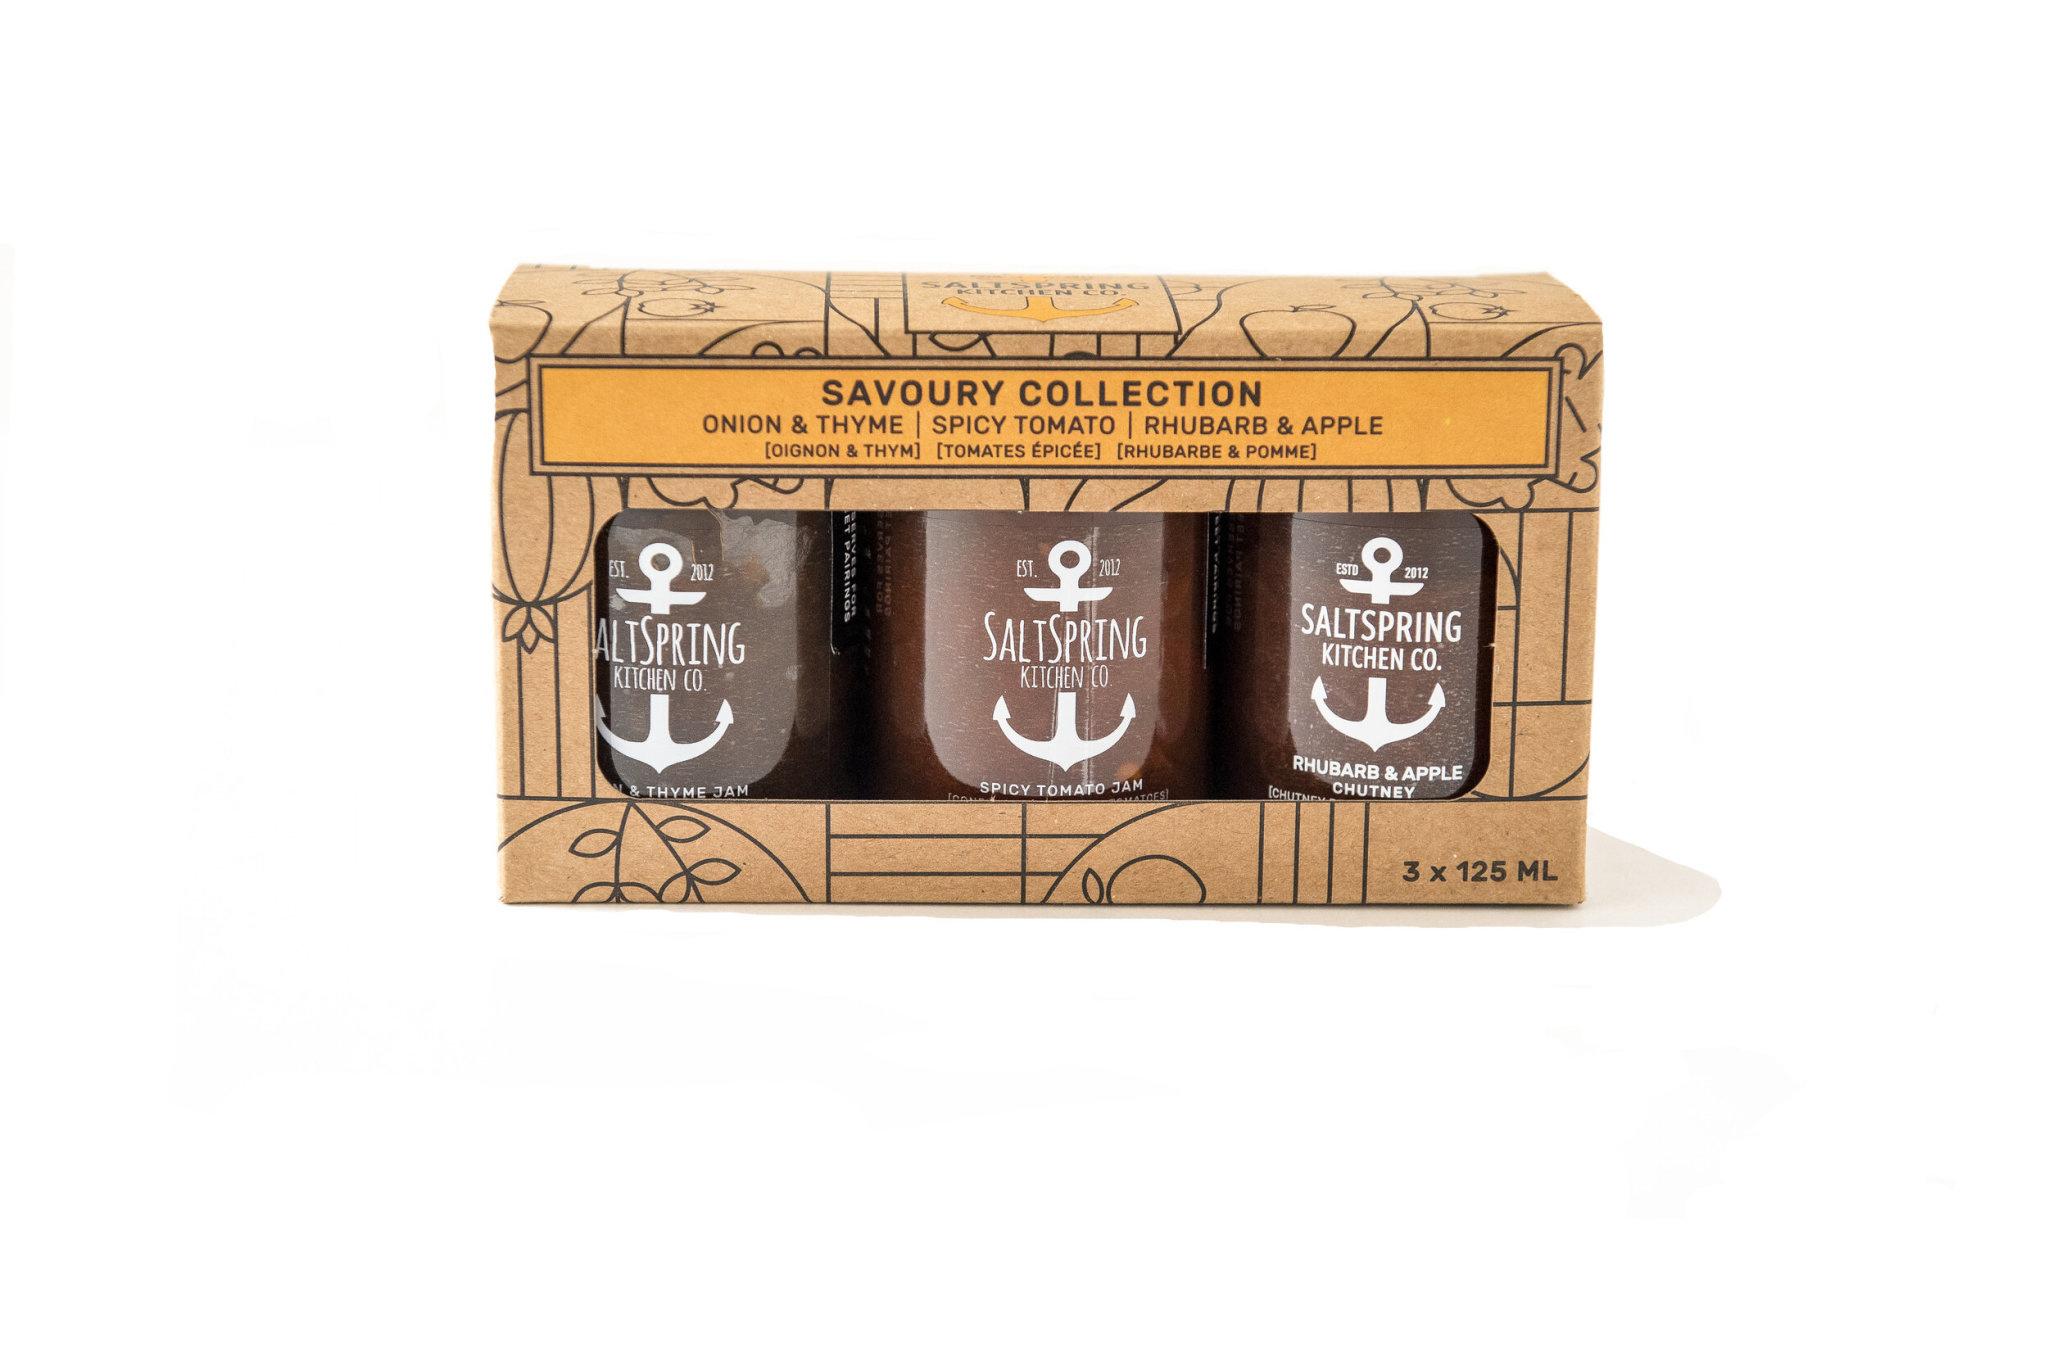 SaltSpring Kitchen Co. Savoury Collection Gift Box 3x125ml Jars